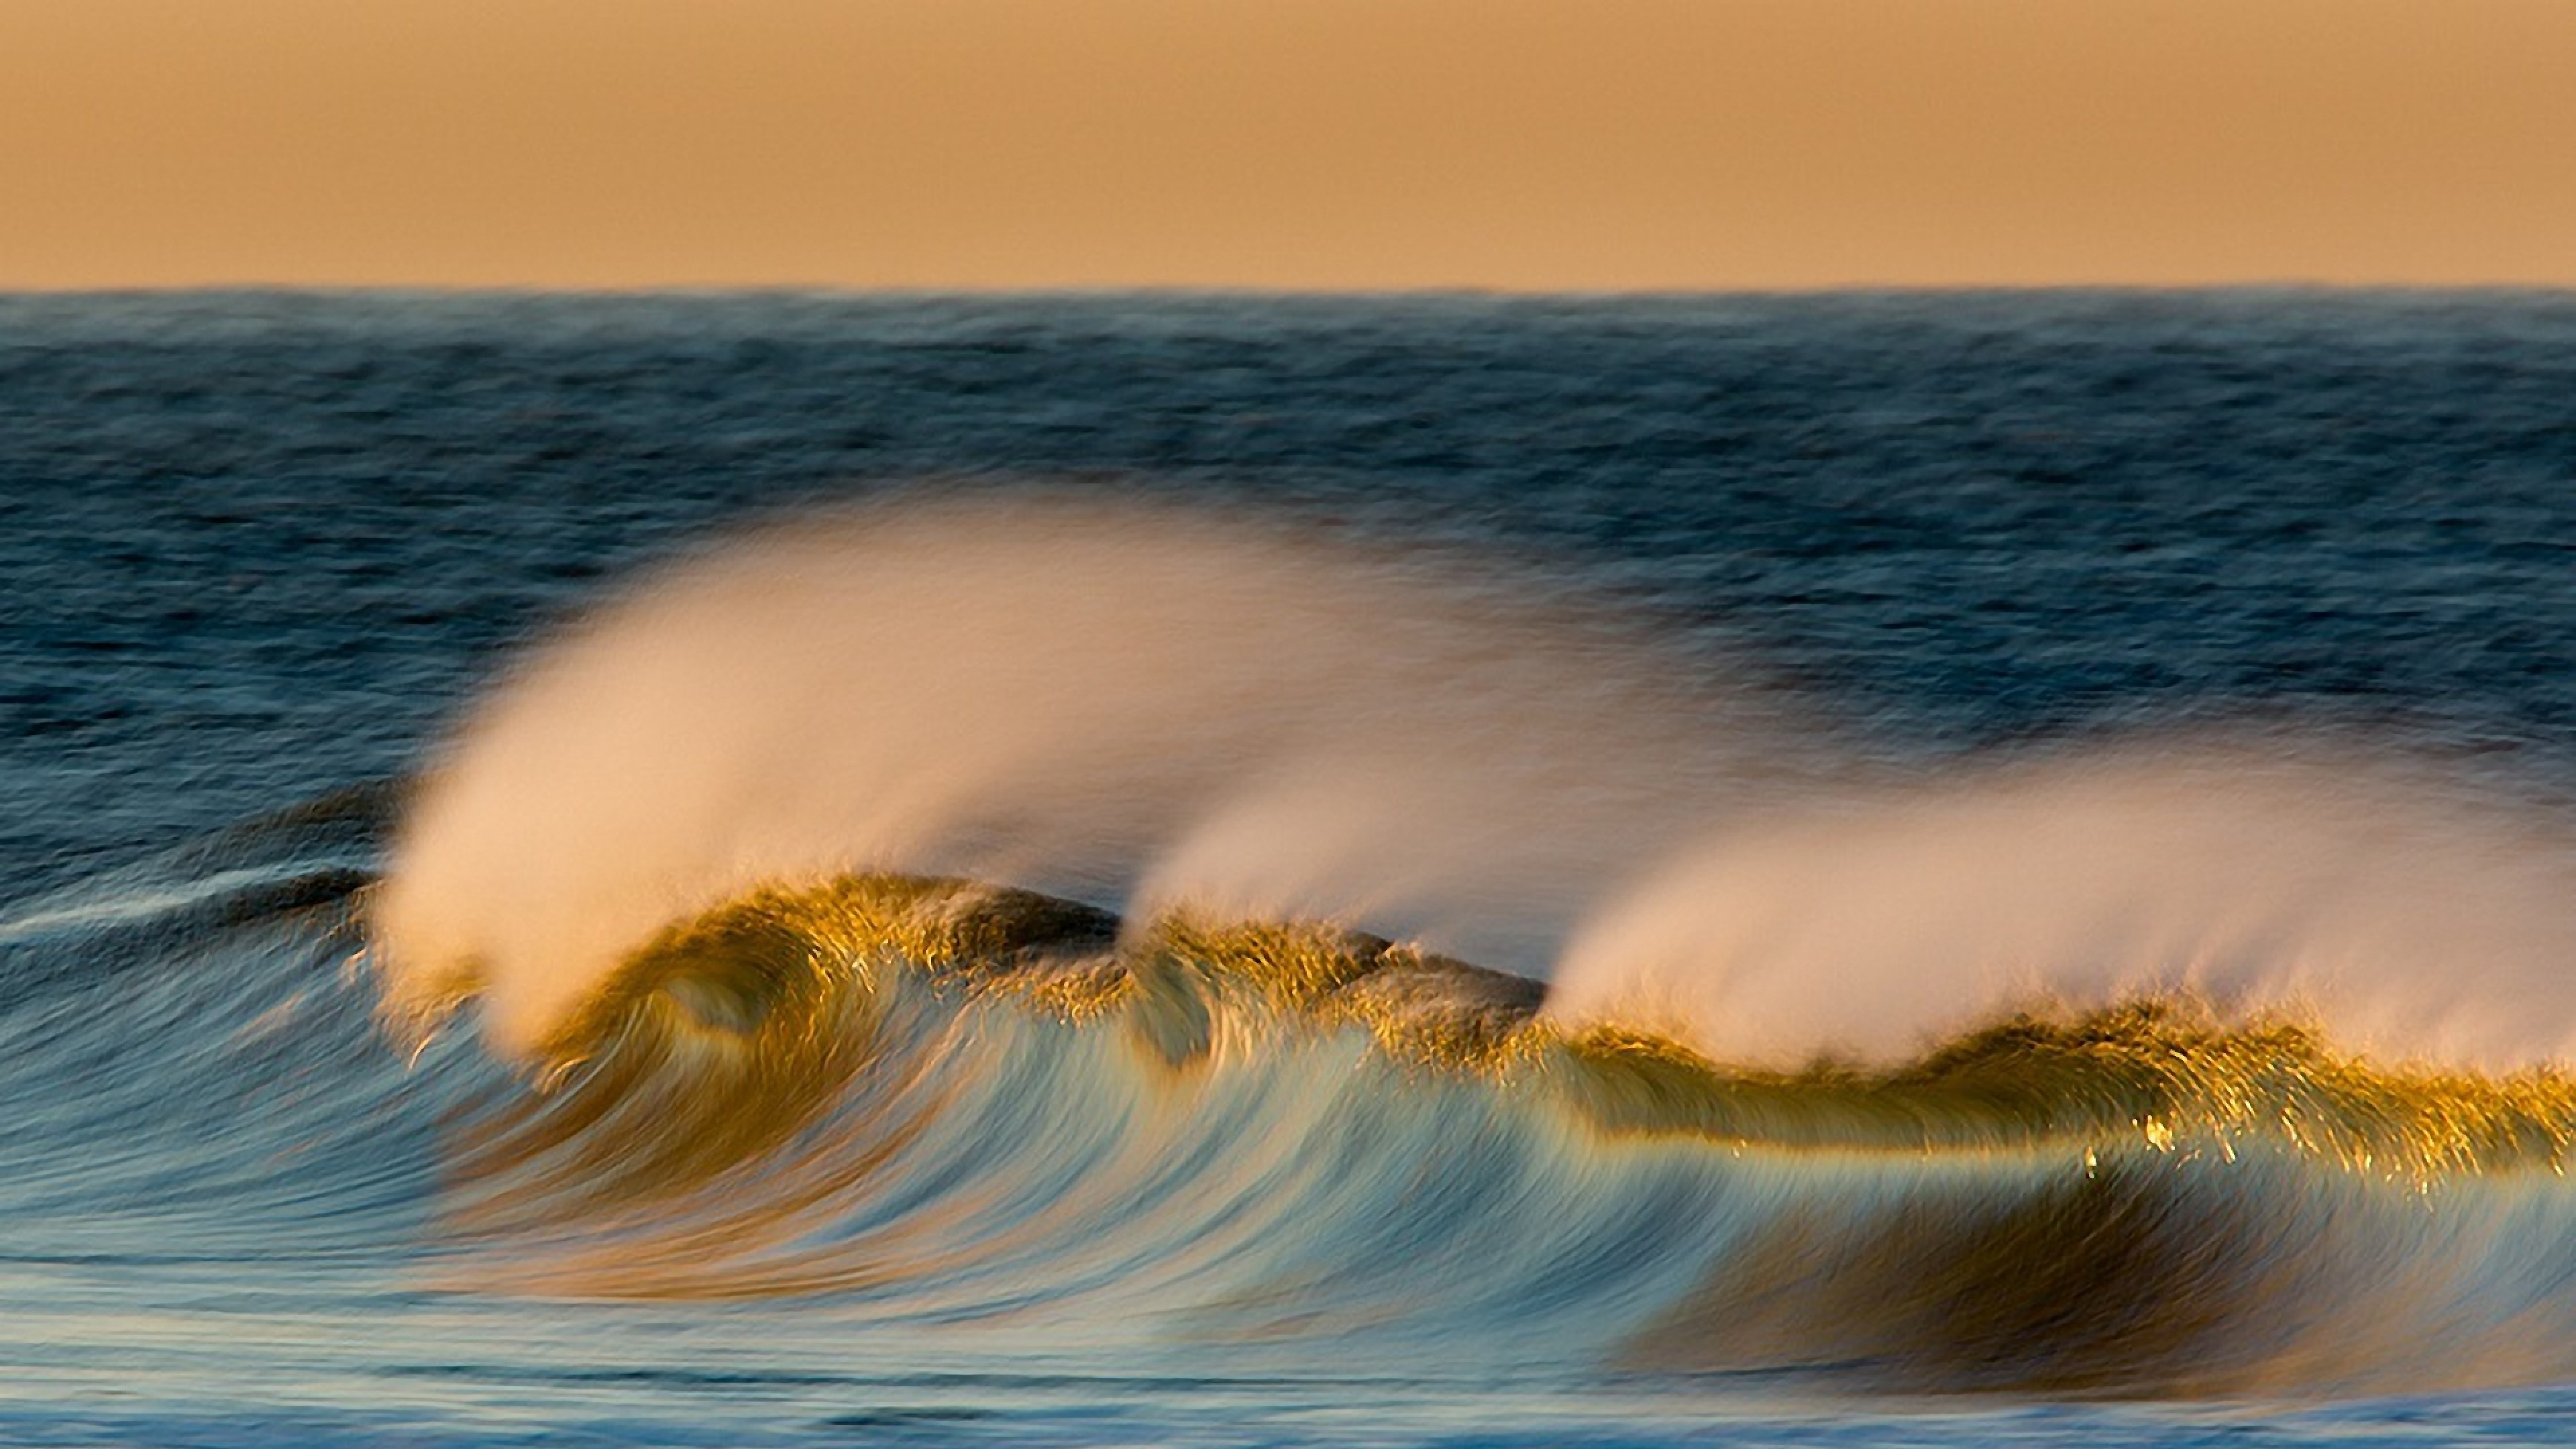 Download Wallpaper 3840x2160 landscape wave ocean sea spray 4K 3840x2160